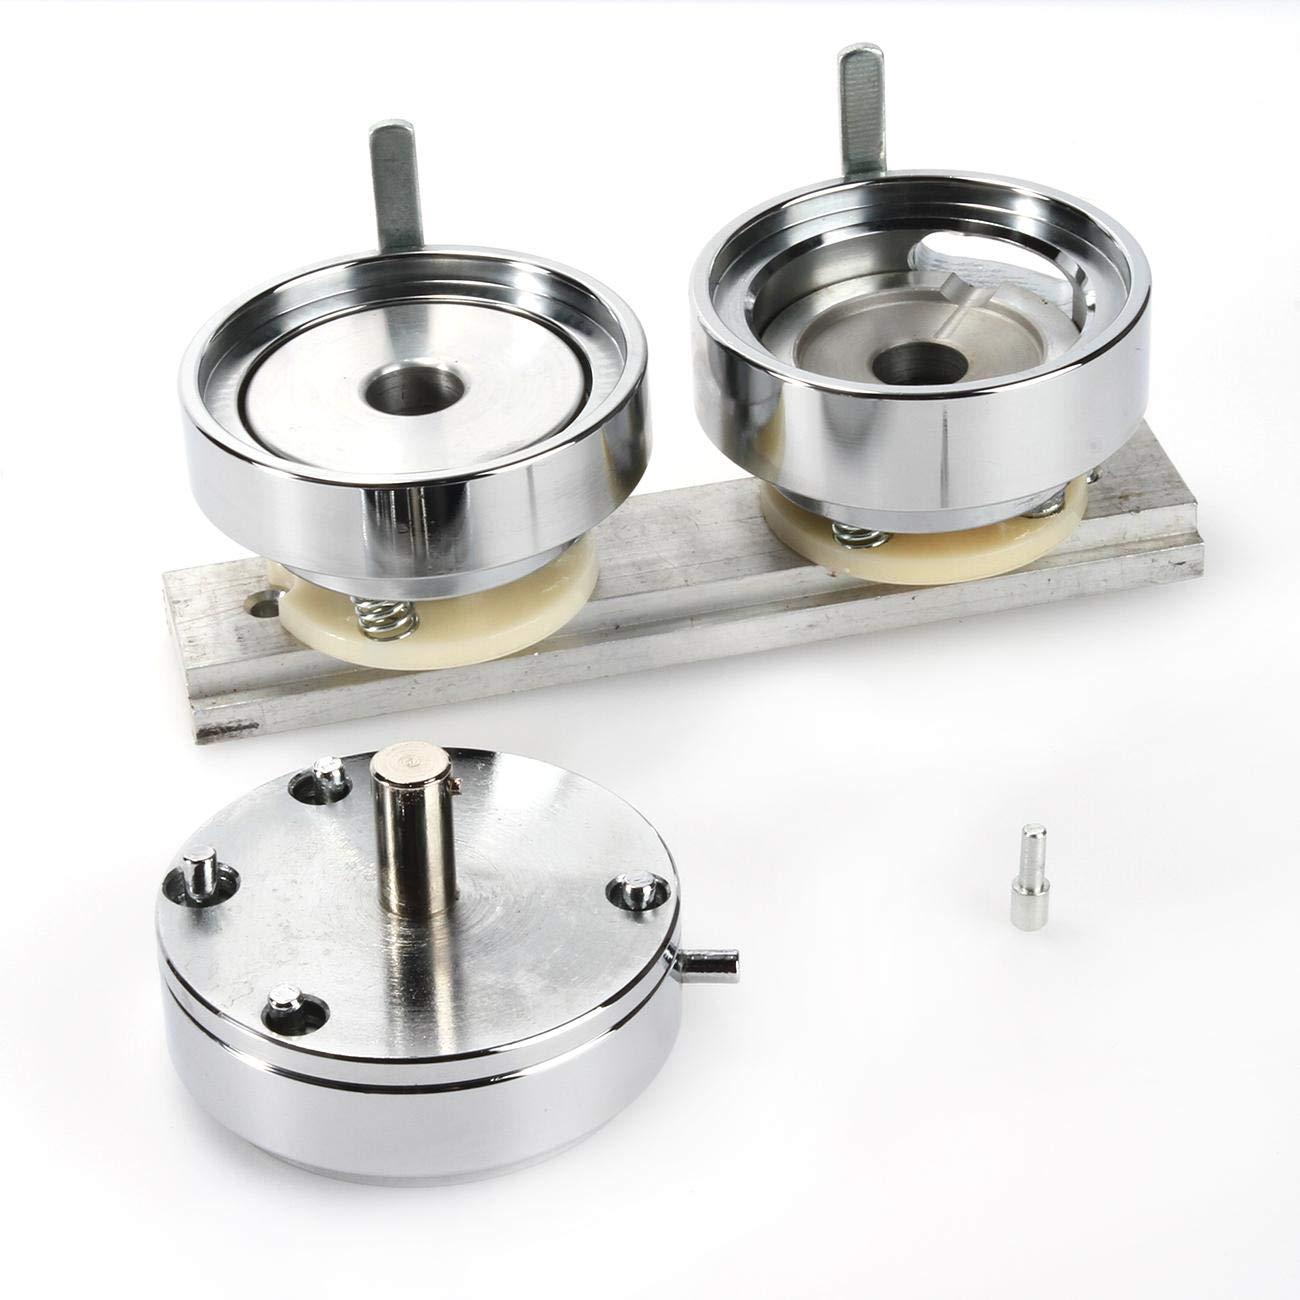 58mm Badge Button Making Mould Machine Punch Press Machine Die Mould kit